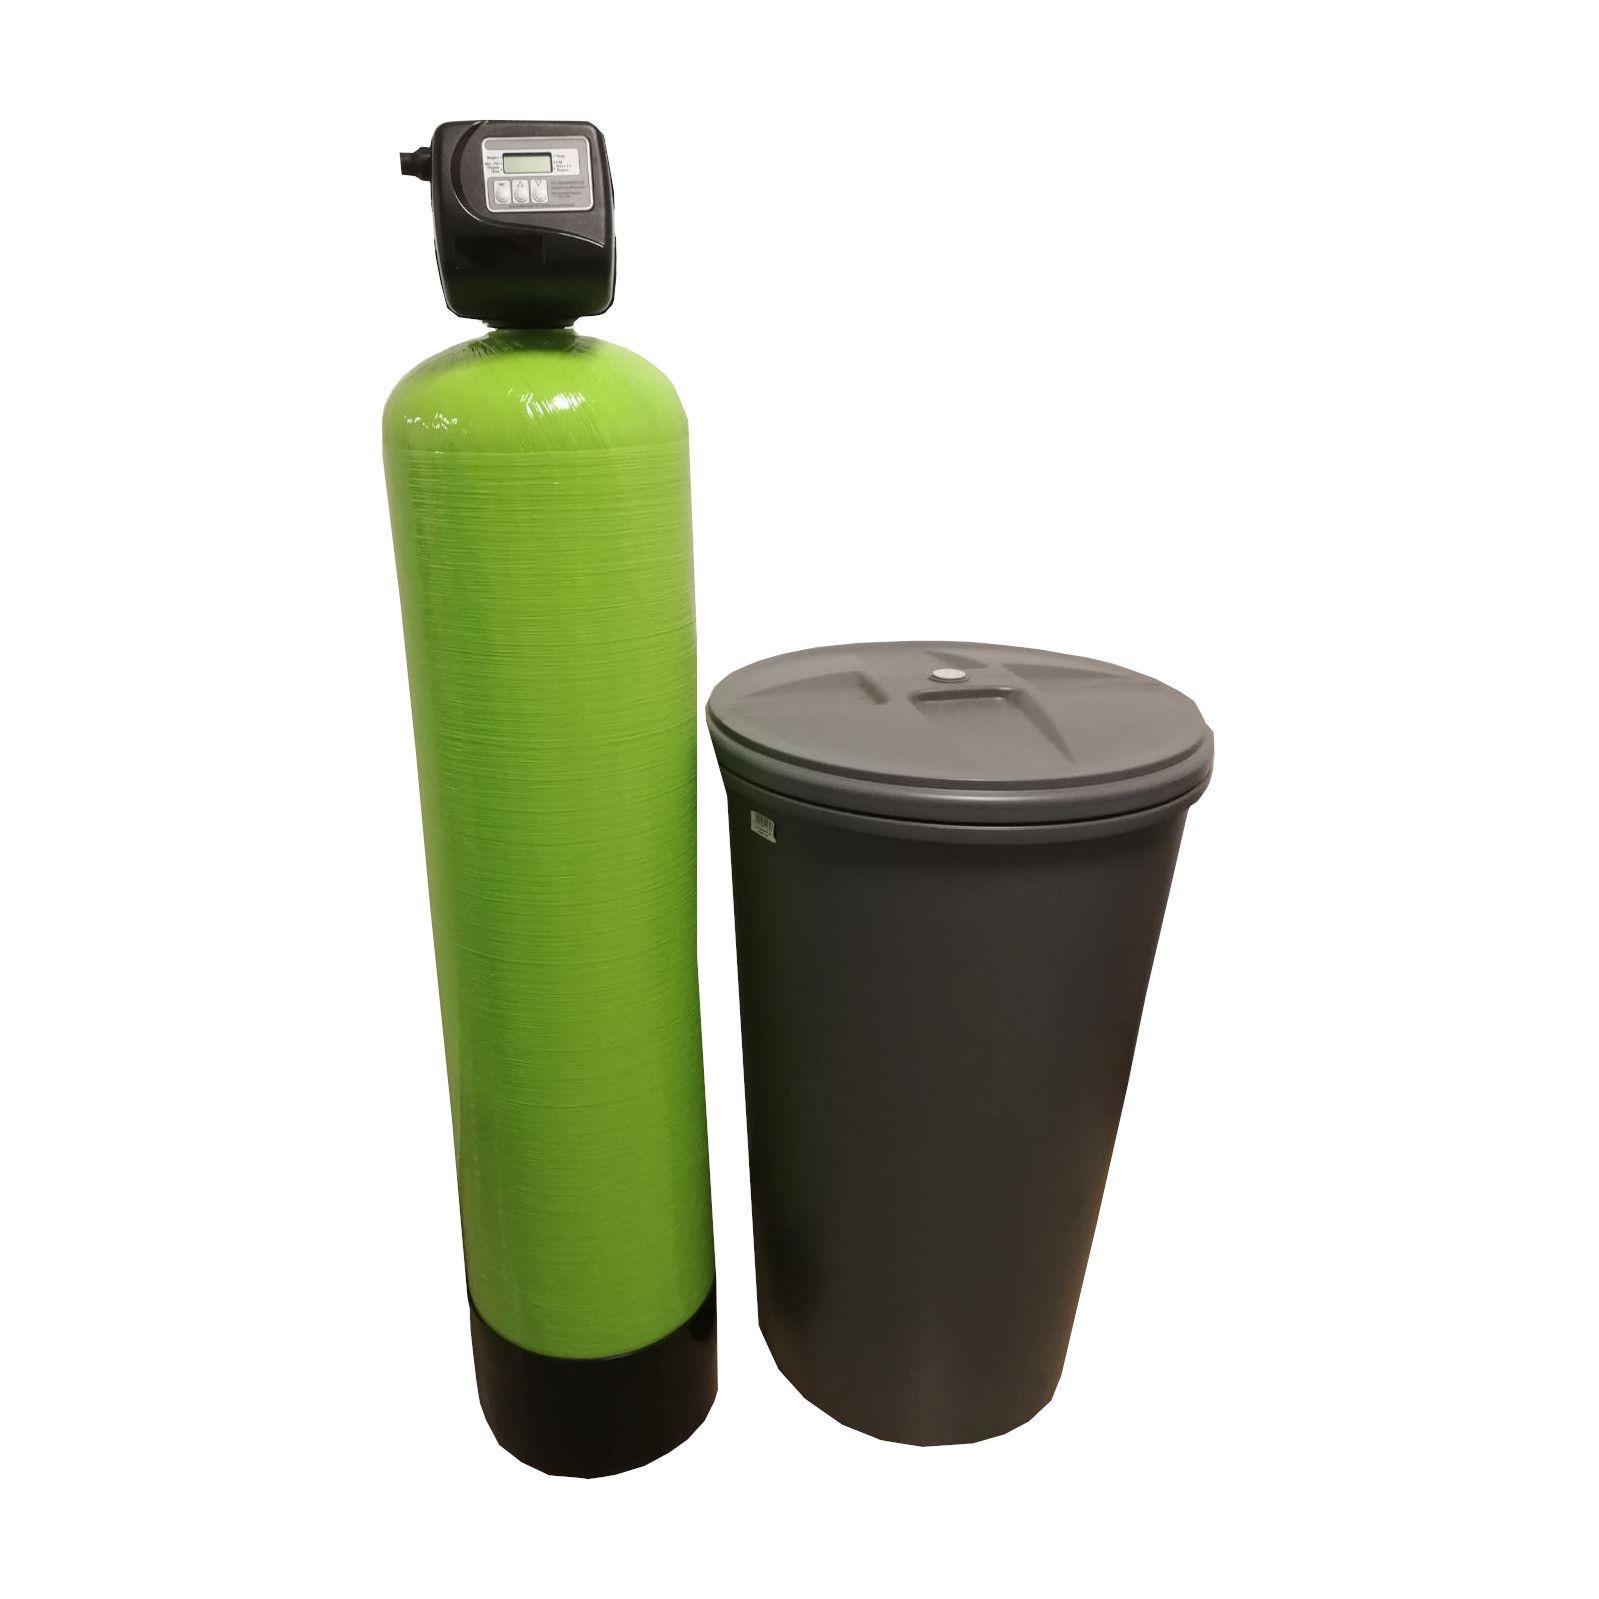 Dedurizator Simplex Aqua 55-Clack SUA-TCD, Debit 3.3 mc/h, Capacitate filtrare 150.000 litri, Cartus din Rasina Cationica - AquaFilters.ro